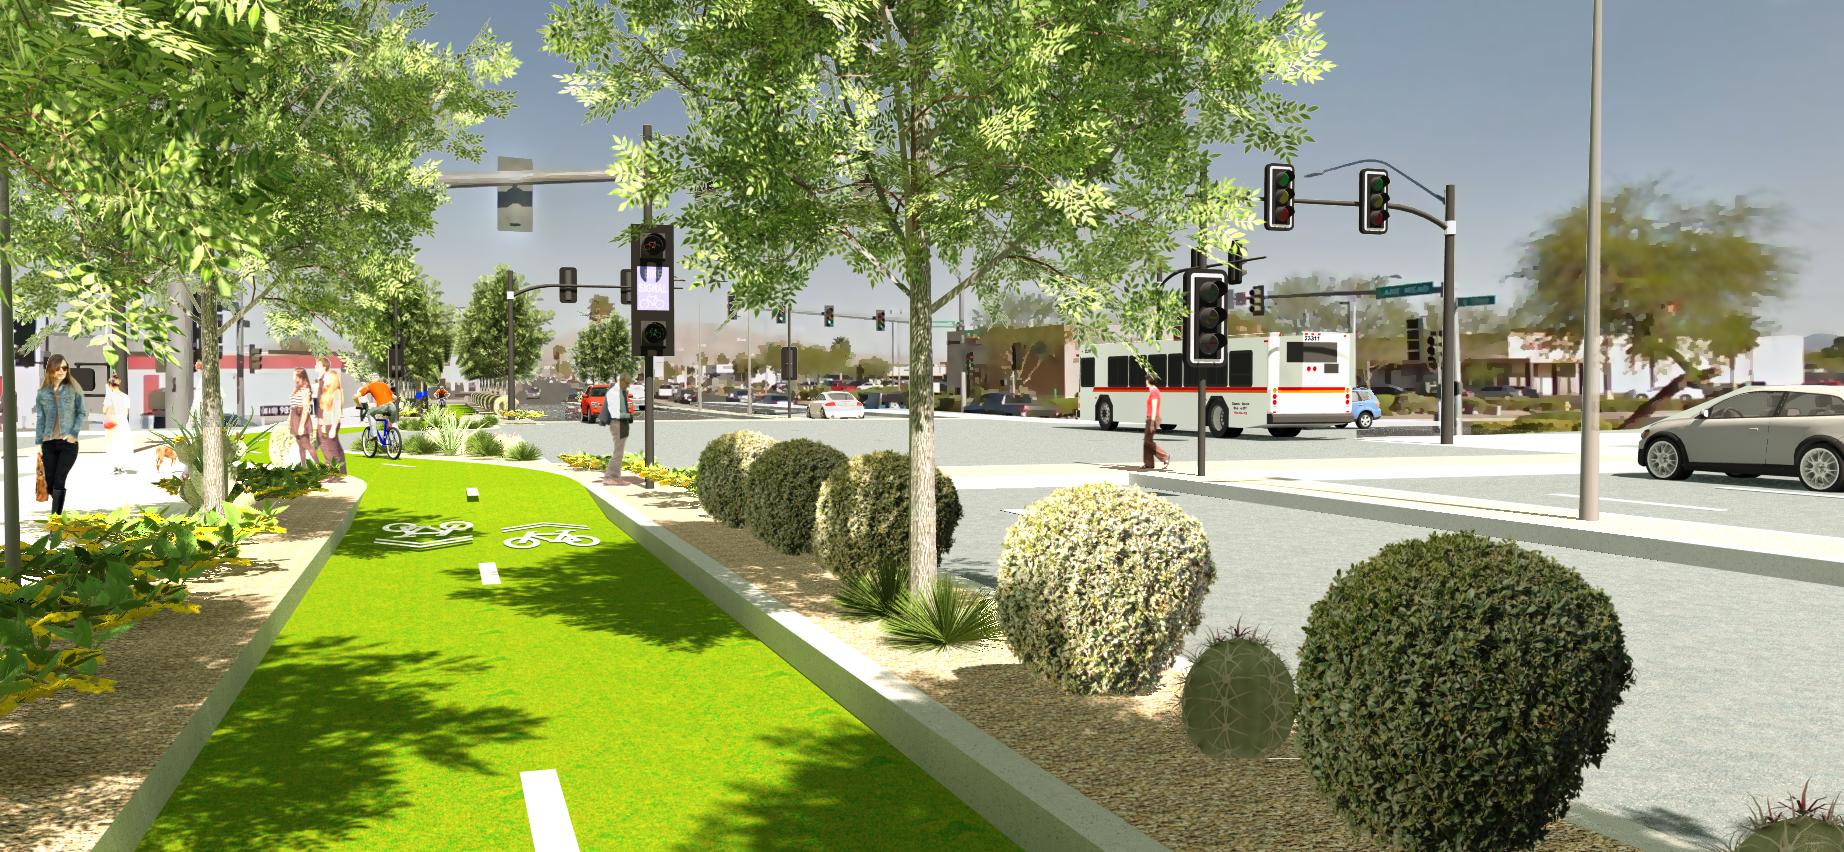 CNLV-complete-streets-lk mead mcdaniel 01